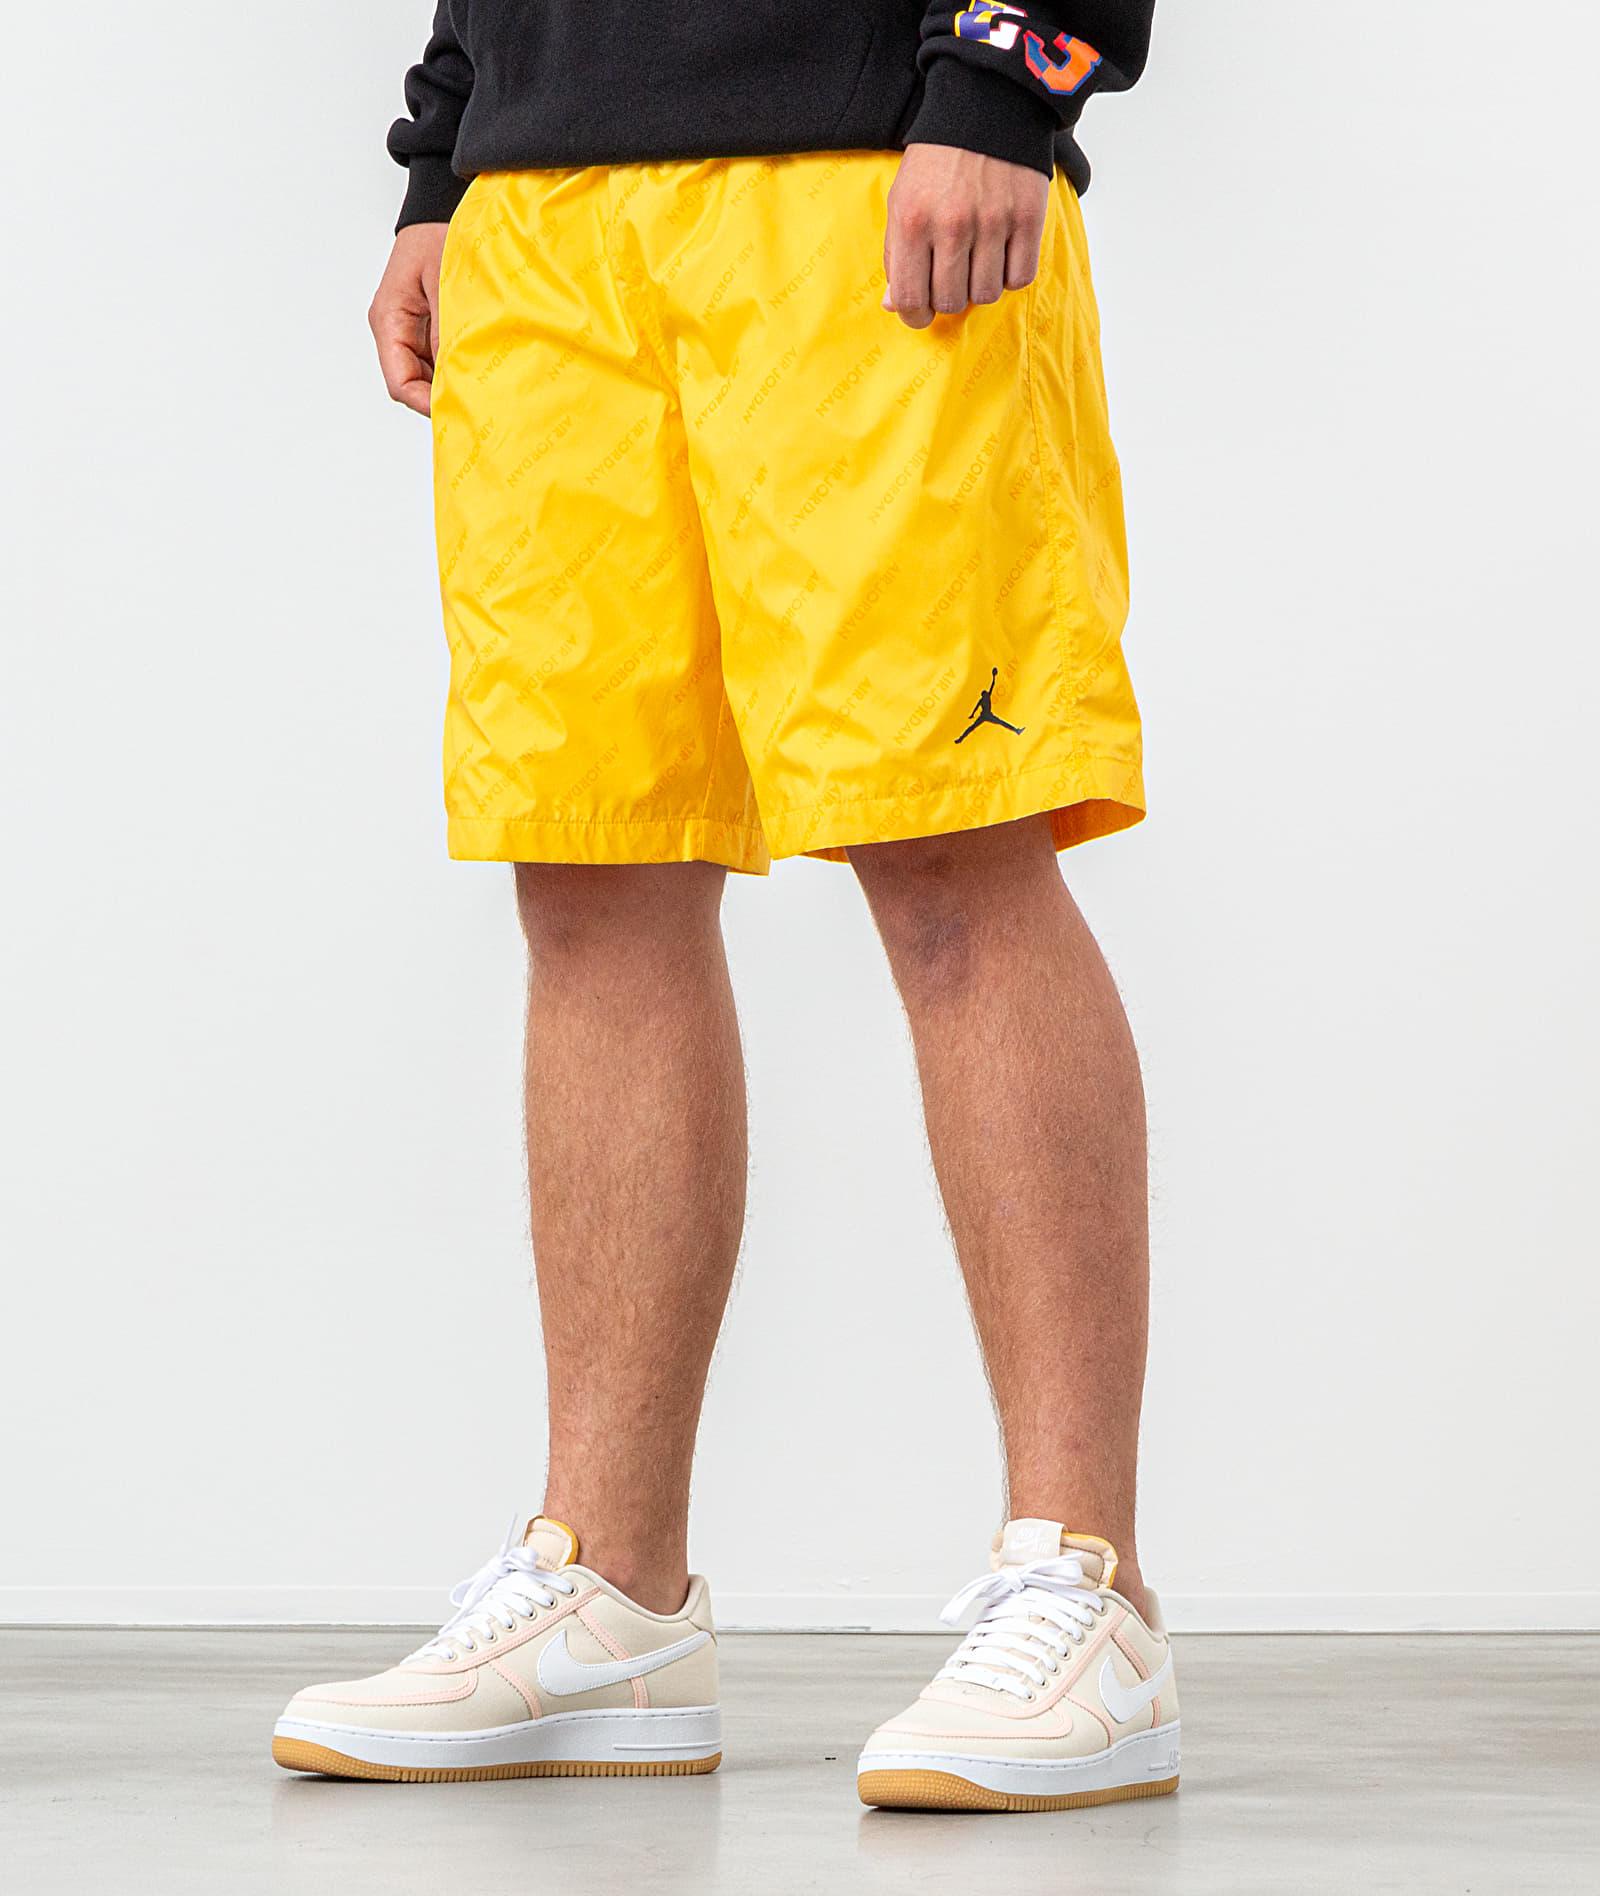 Jordan Legacy AJ4 Shorts Varsity Maize, Yellow